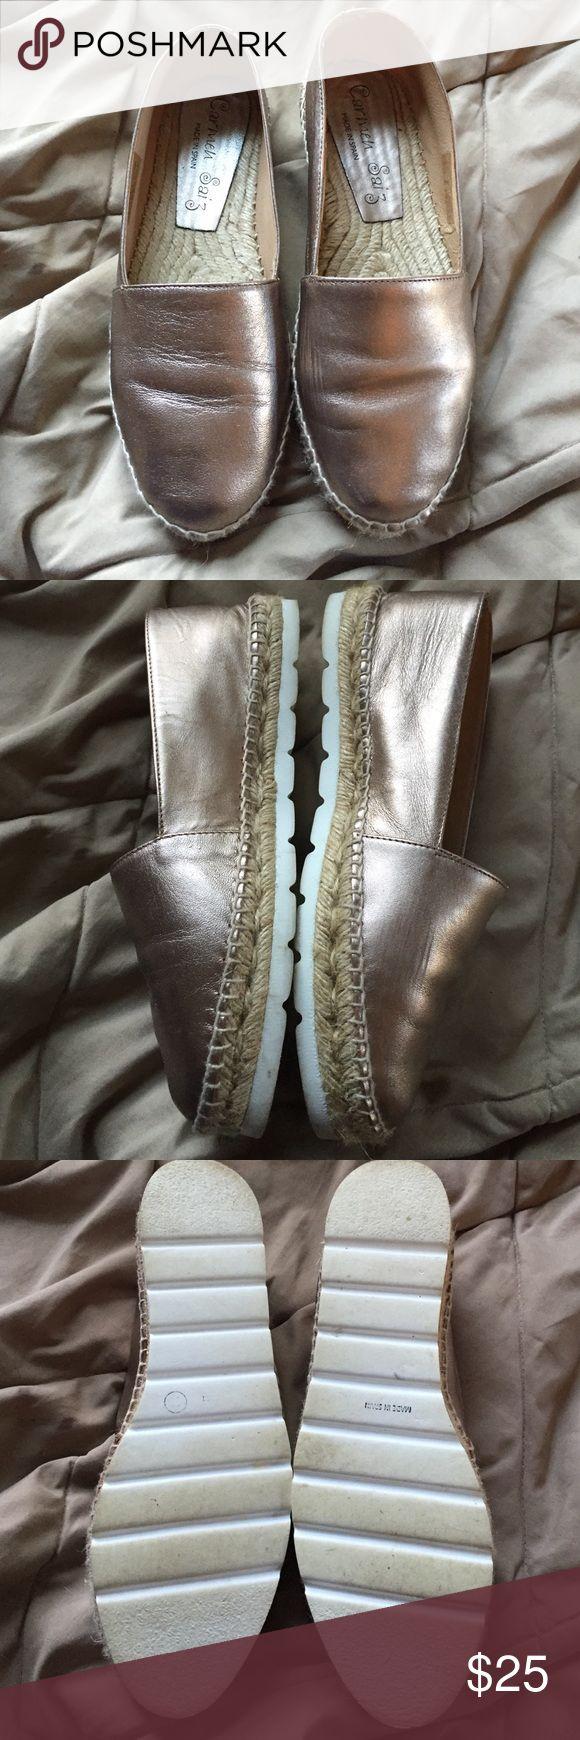 Carmen Saiz gold espadrilles. Worn once Carmen Saiz gold espadrilles. Worn once. Absolutely gorgeous comfy shoes Carmen Saiz Shoes Espadrilles